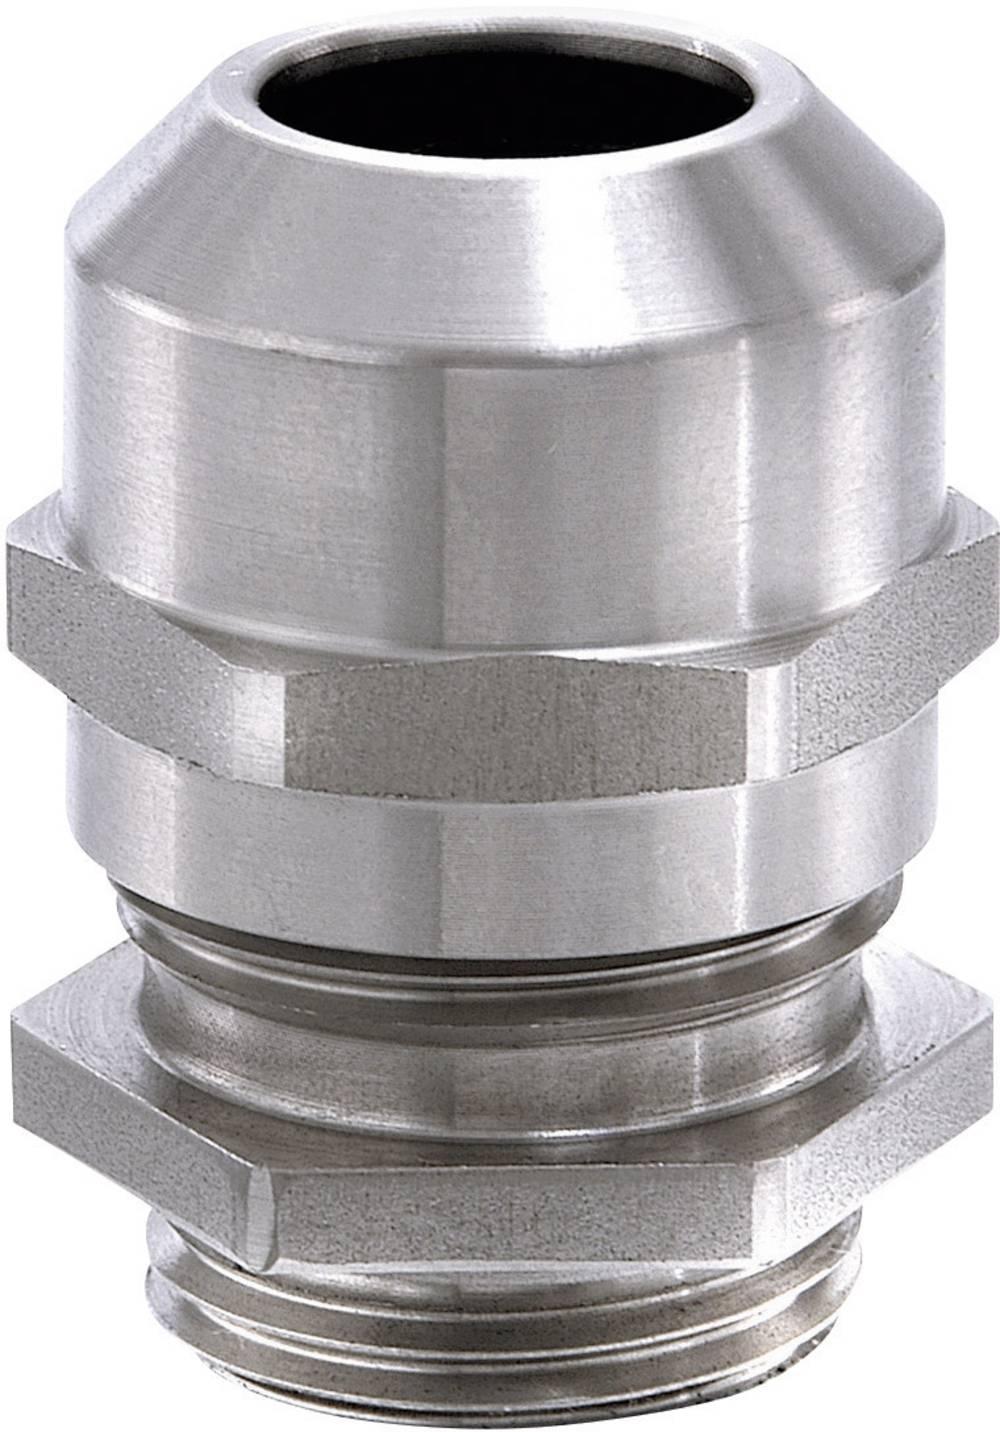 Kabelforskruning Wiska ESSKV 20 M20 Rustfrit stål Rustfrit stål 10 stk